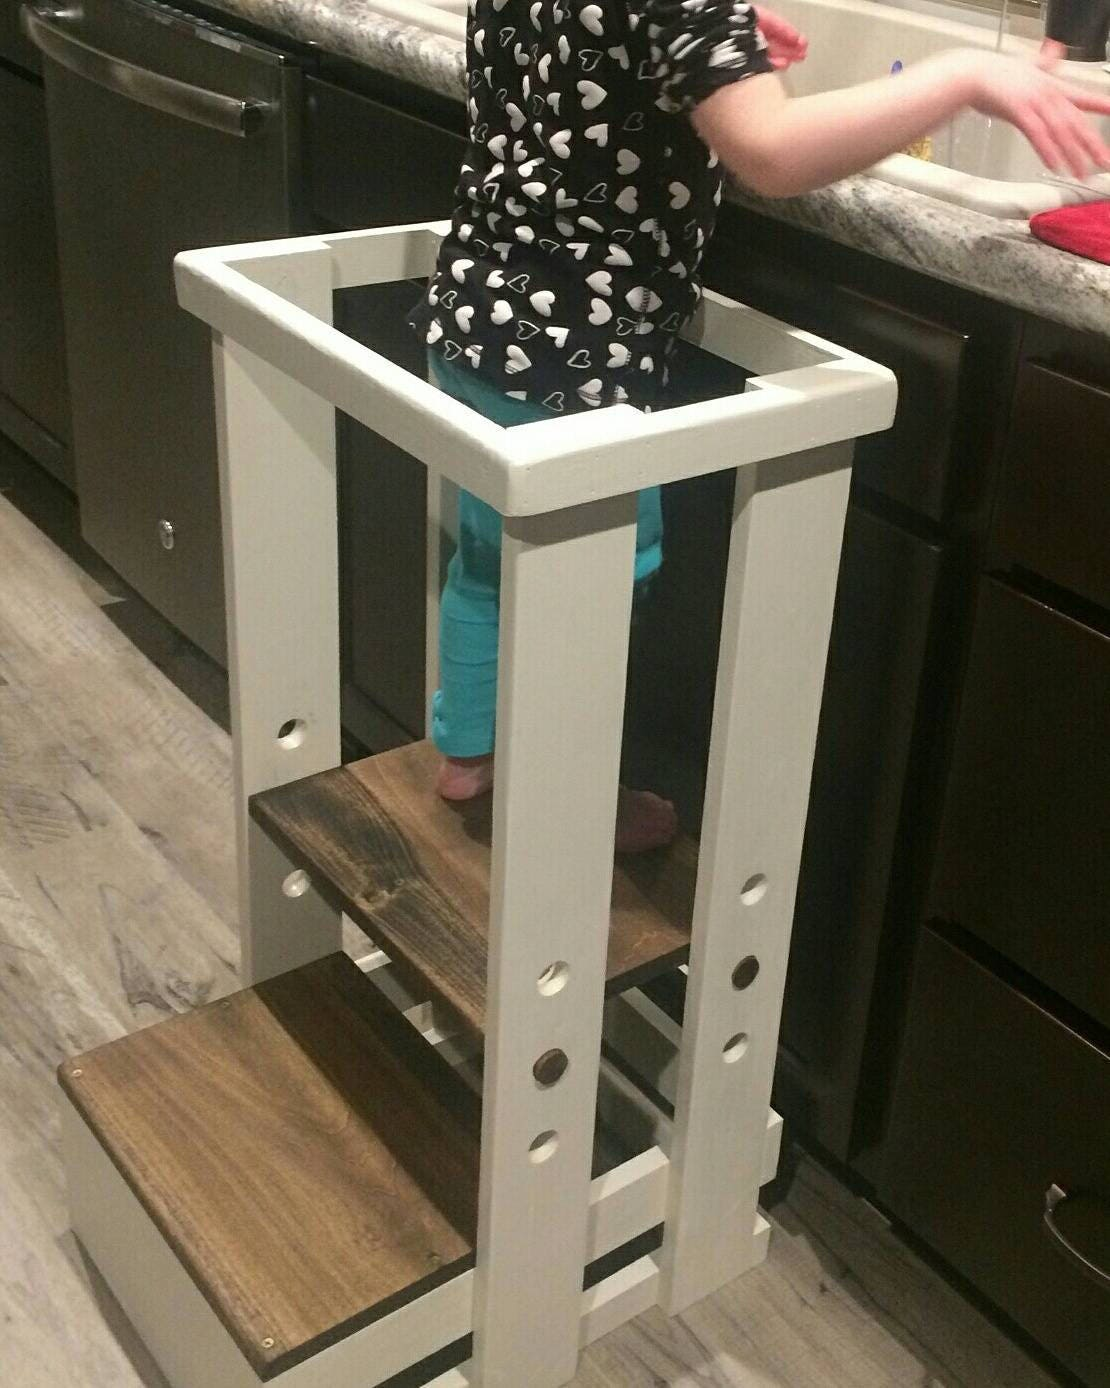 Safe Toddler stool Child Safety Kitchen Stool mommy's